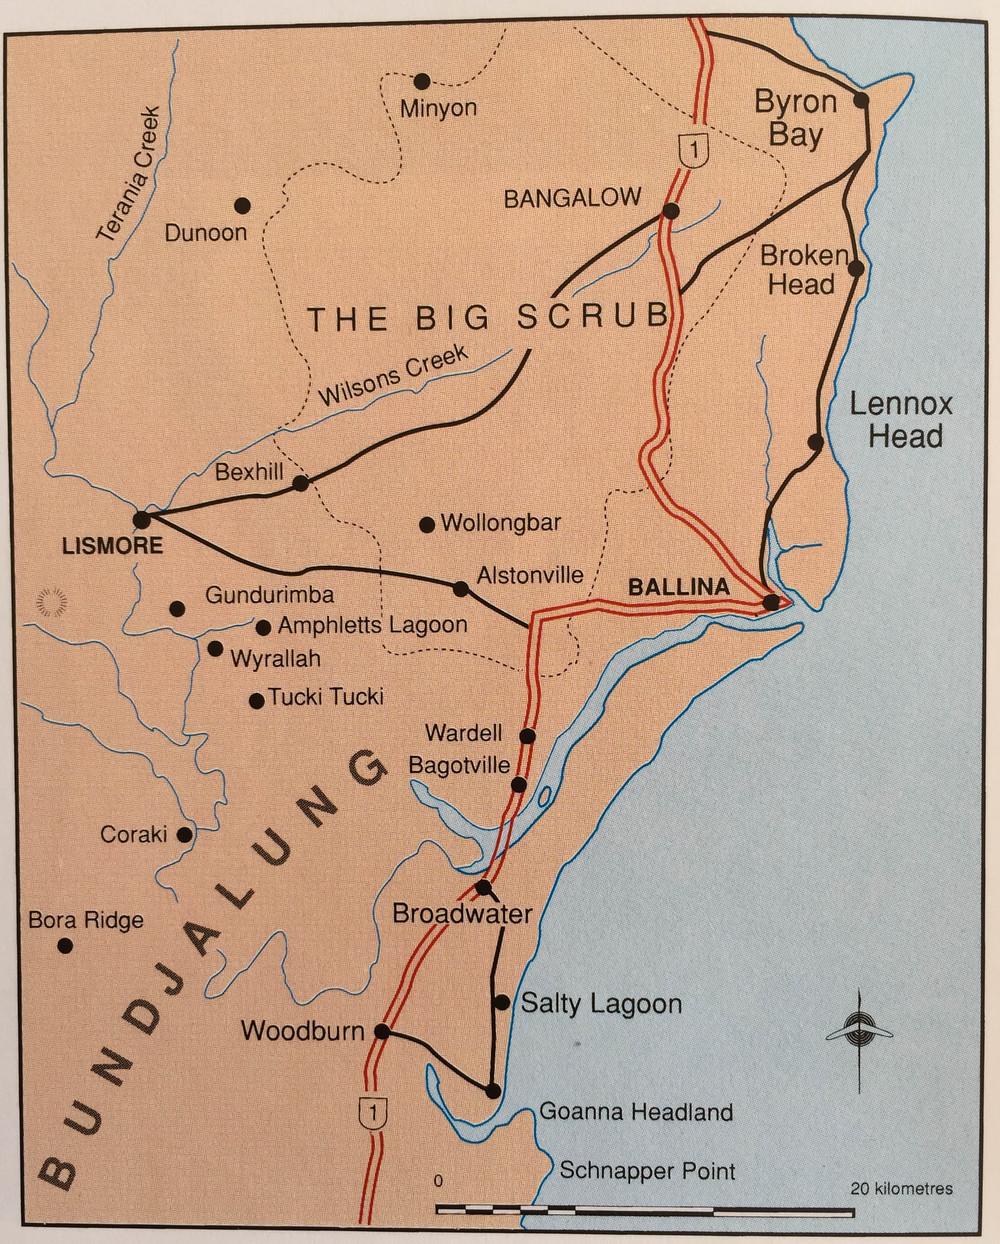 4-16-15 Goana Headland map.jpg